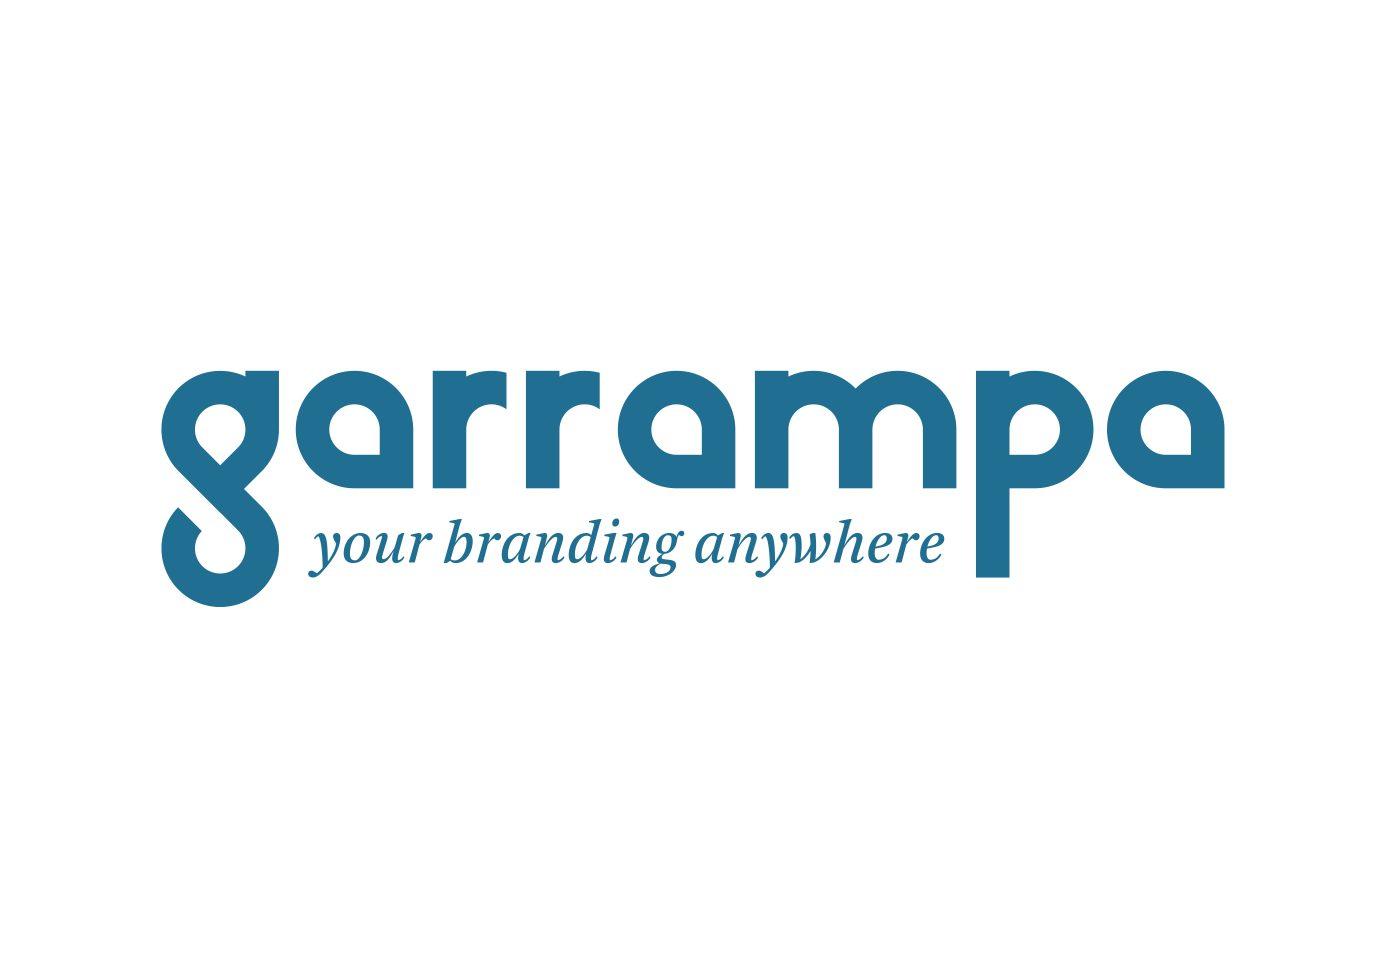 Garrampa